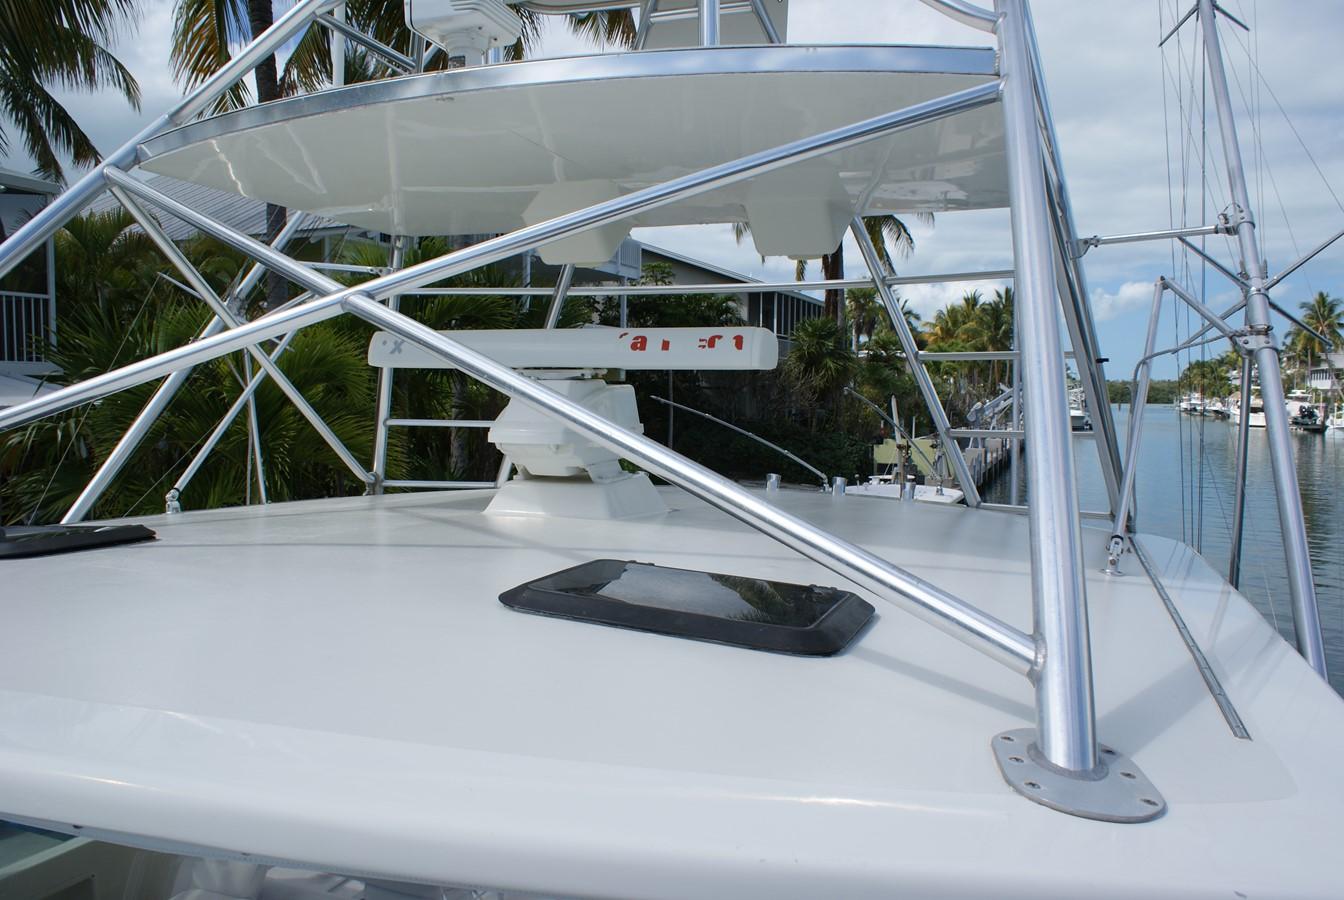 1998 TIARA Open W/Tower Motor Yacht 2507475